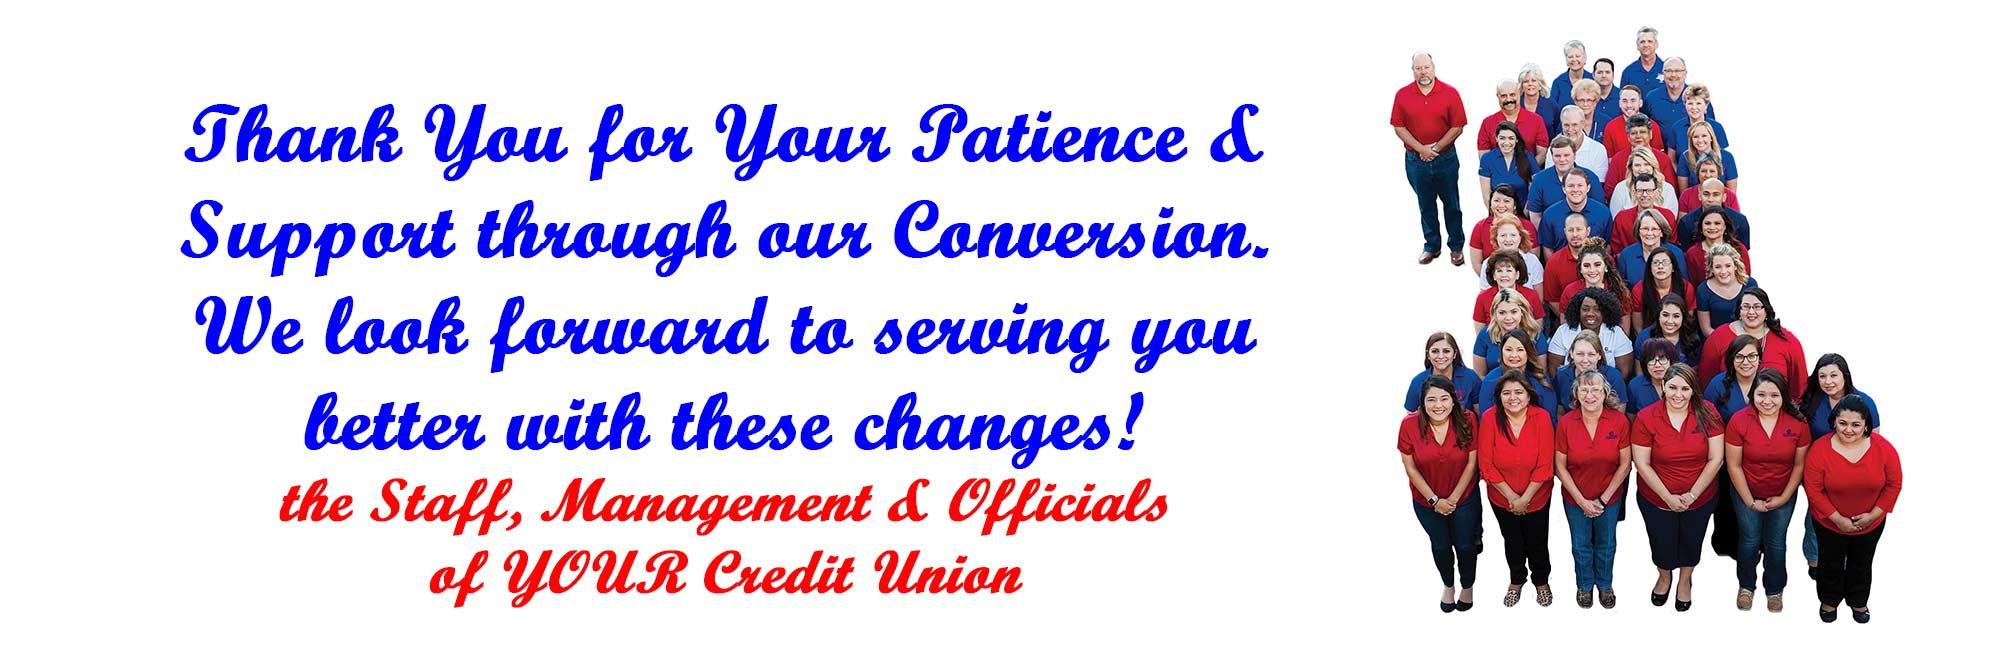 Conversion thank you